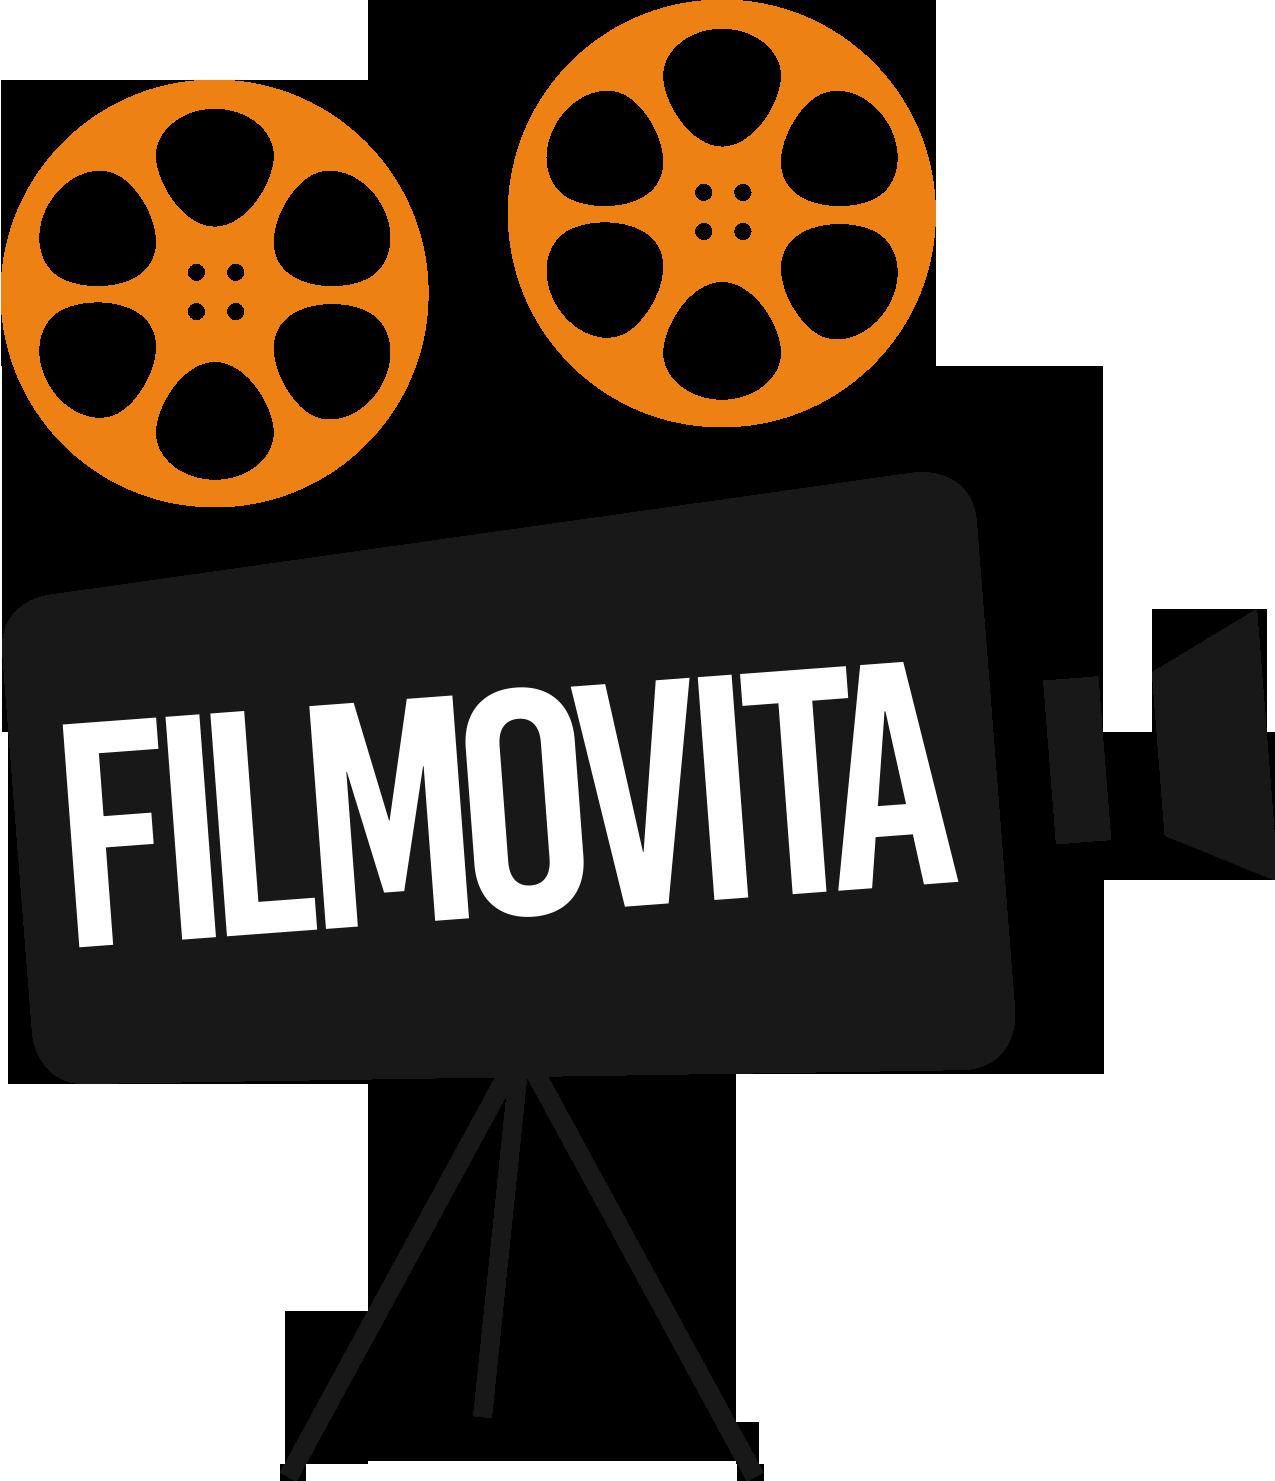 filmovita-filmovi